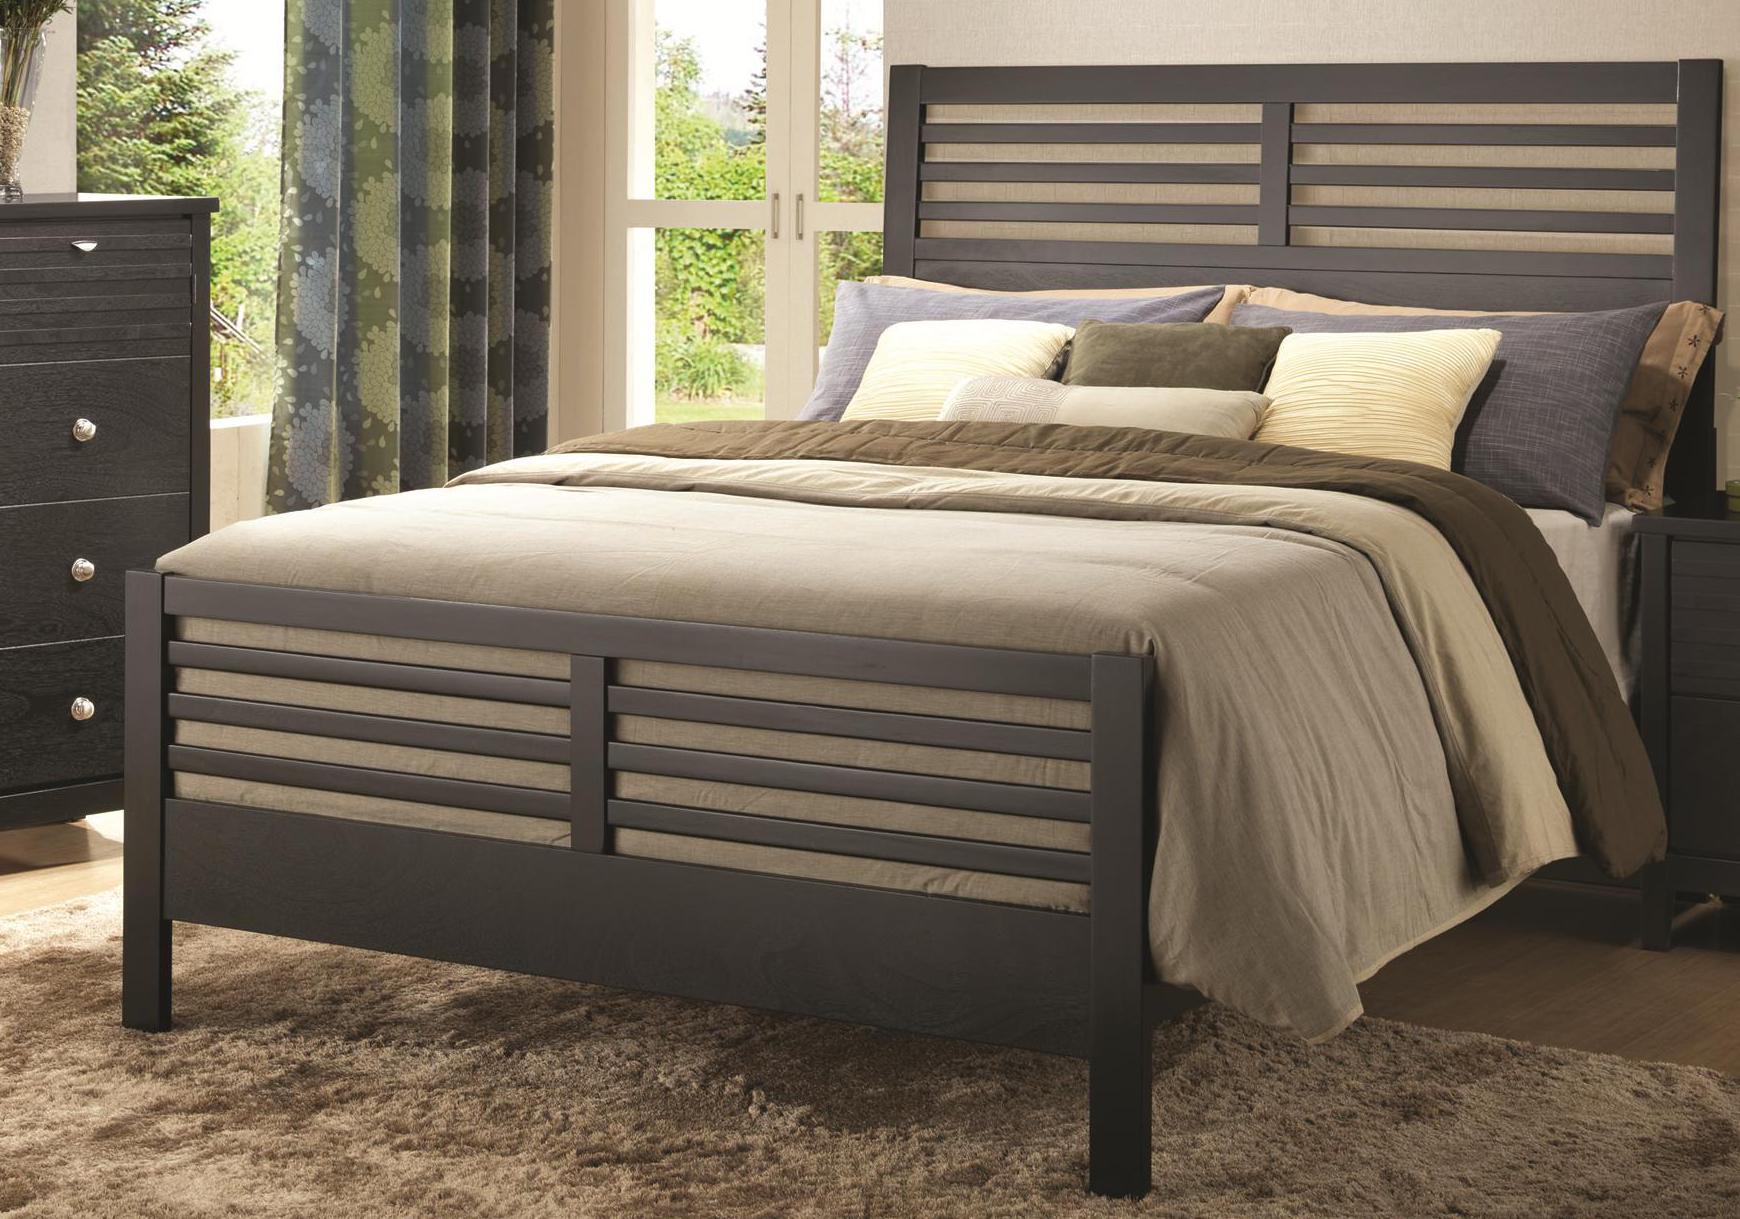 Richmond-Queen-Bed | Richmond-Queen-Bed | Pinterest | Muebles y Ropa ...